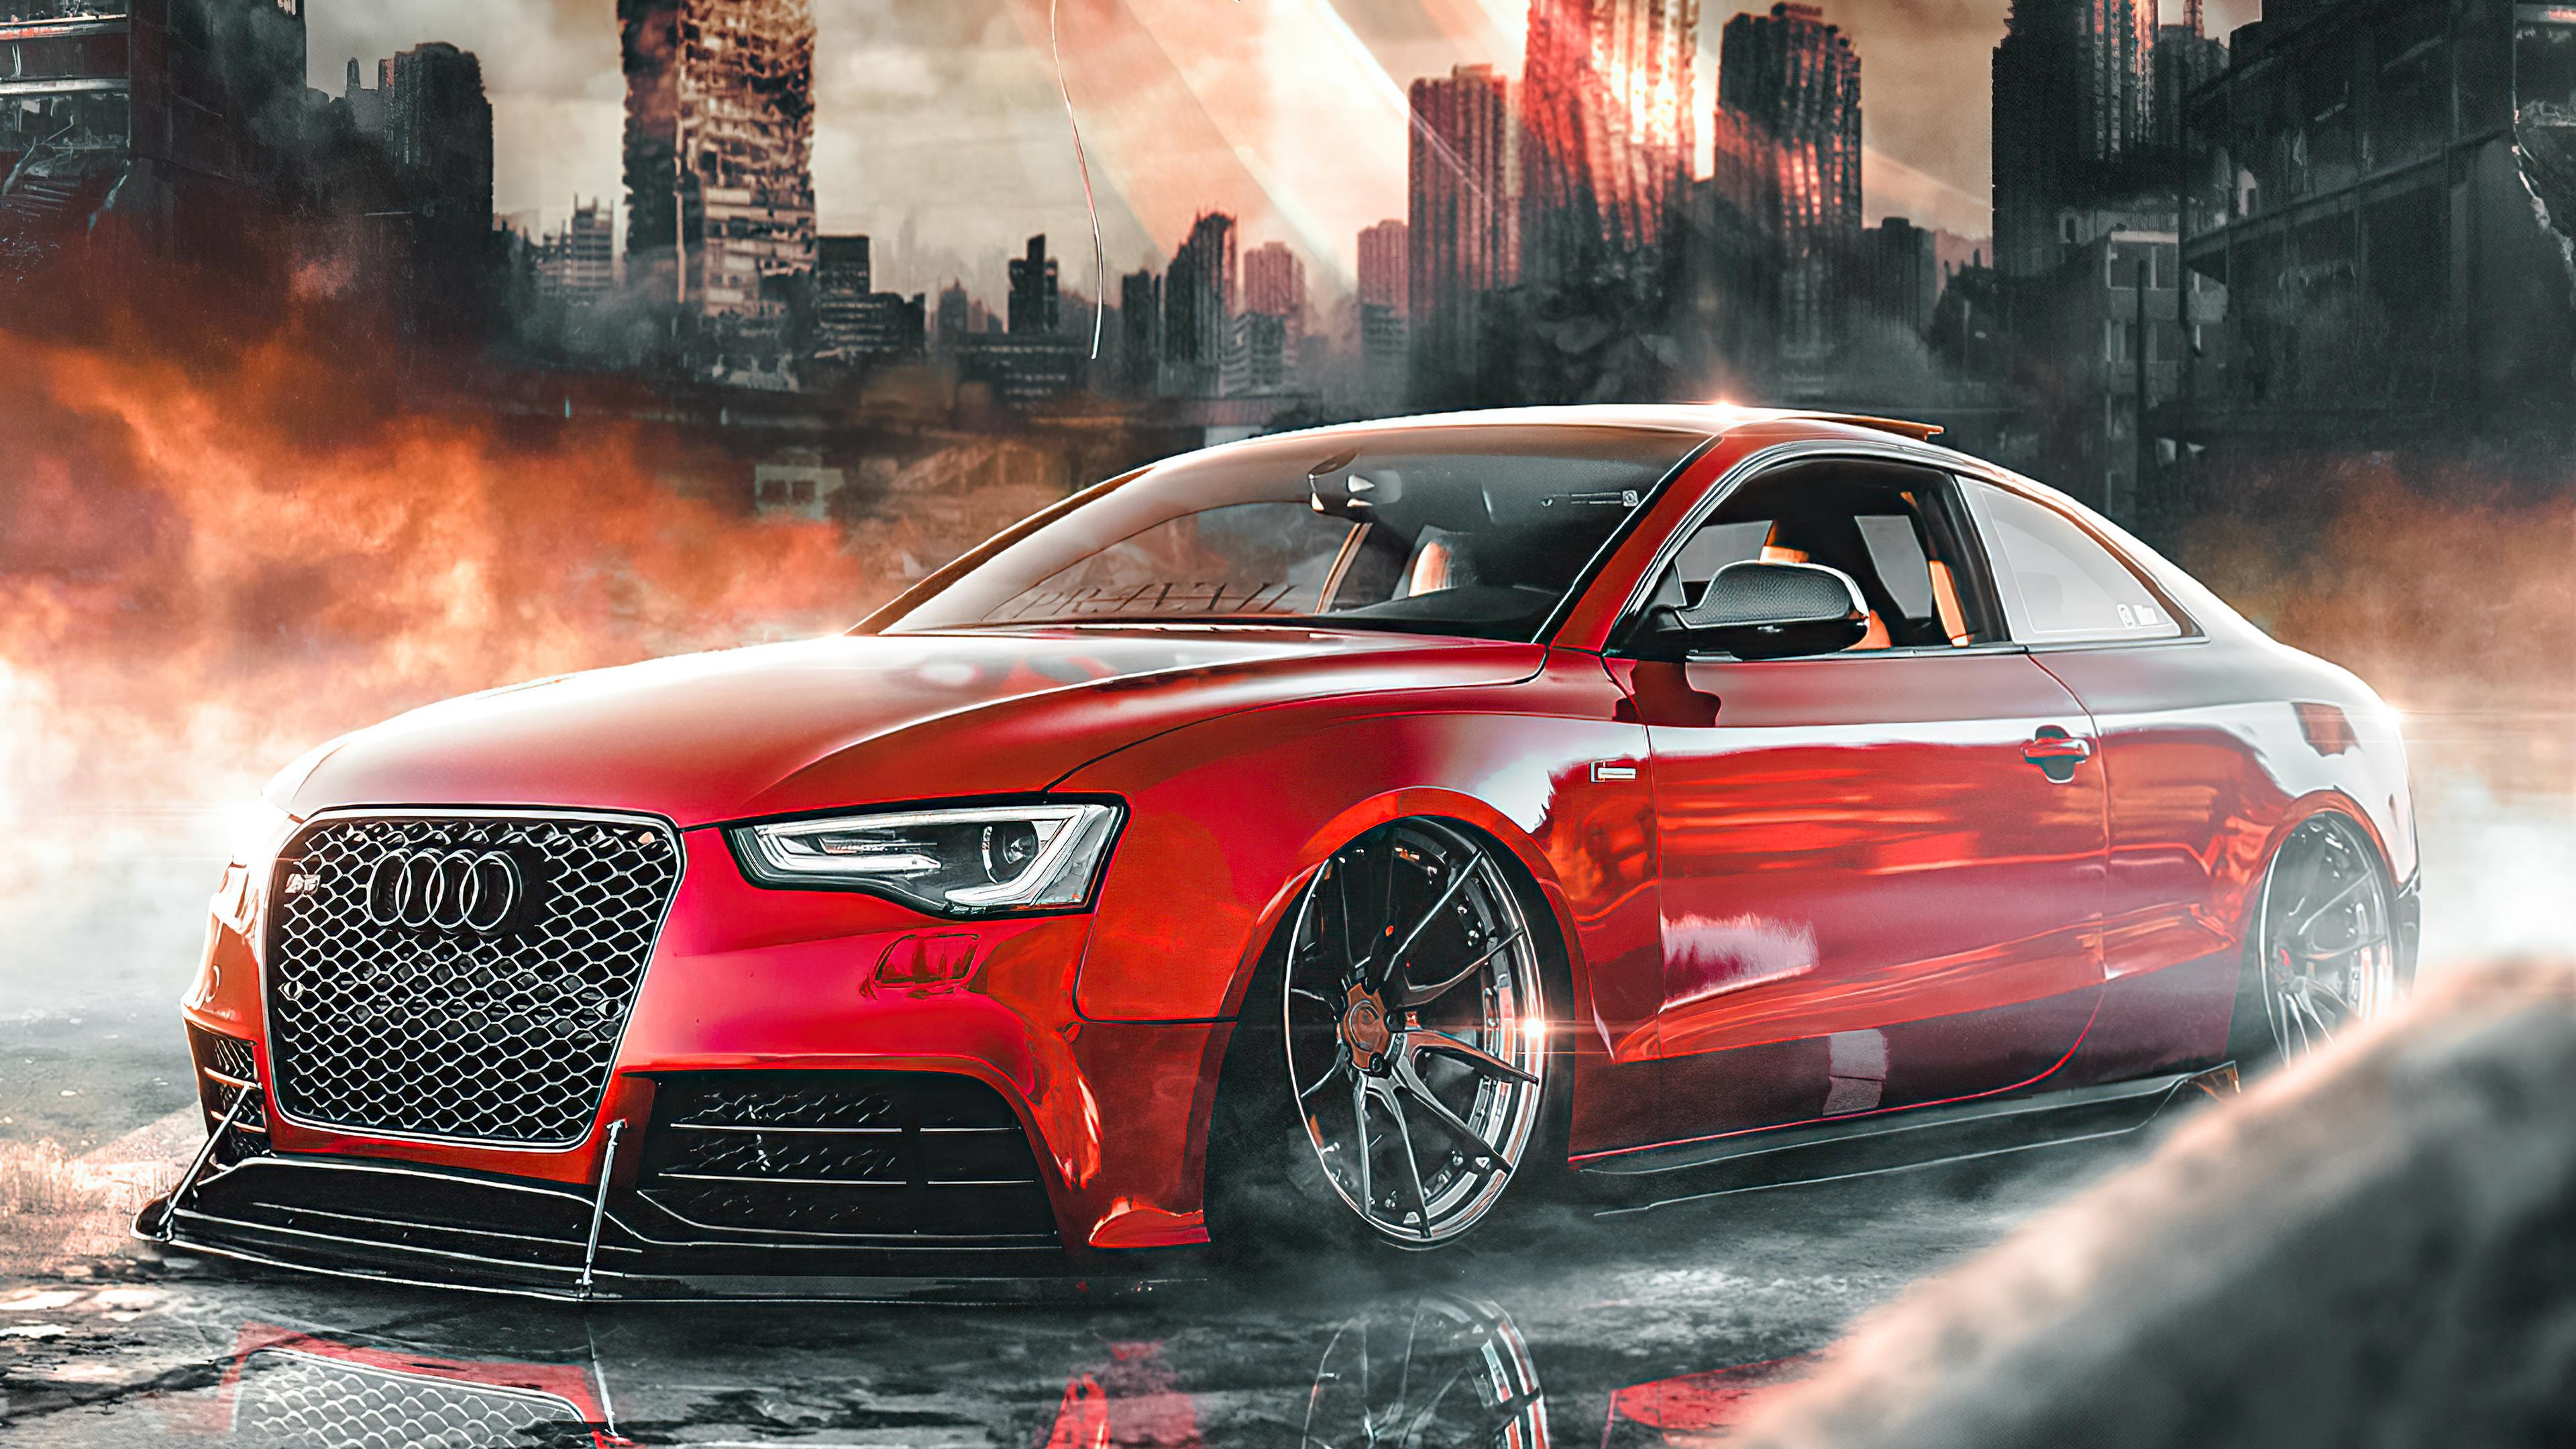 vengeance graphix audi rs5 spiderman 4k 1618920300 - Vengeance Graphix Audi Rs5 Spiderman 4k - Vengeance Graphix Audi Rs5 Spiderman 4k wallpapers